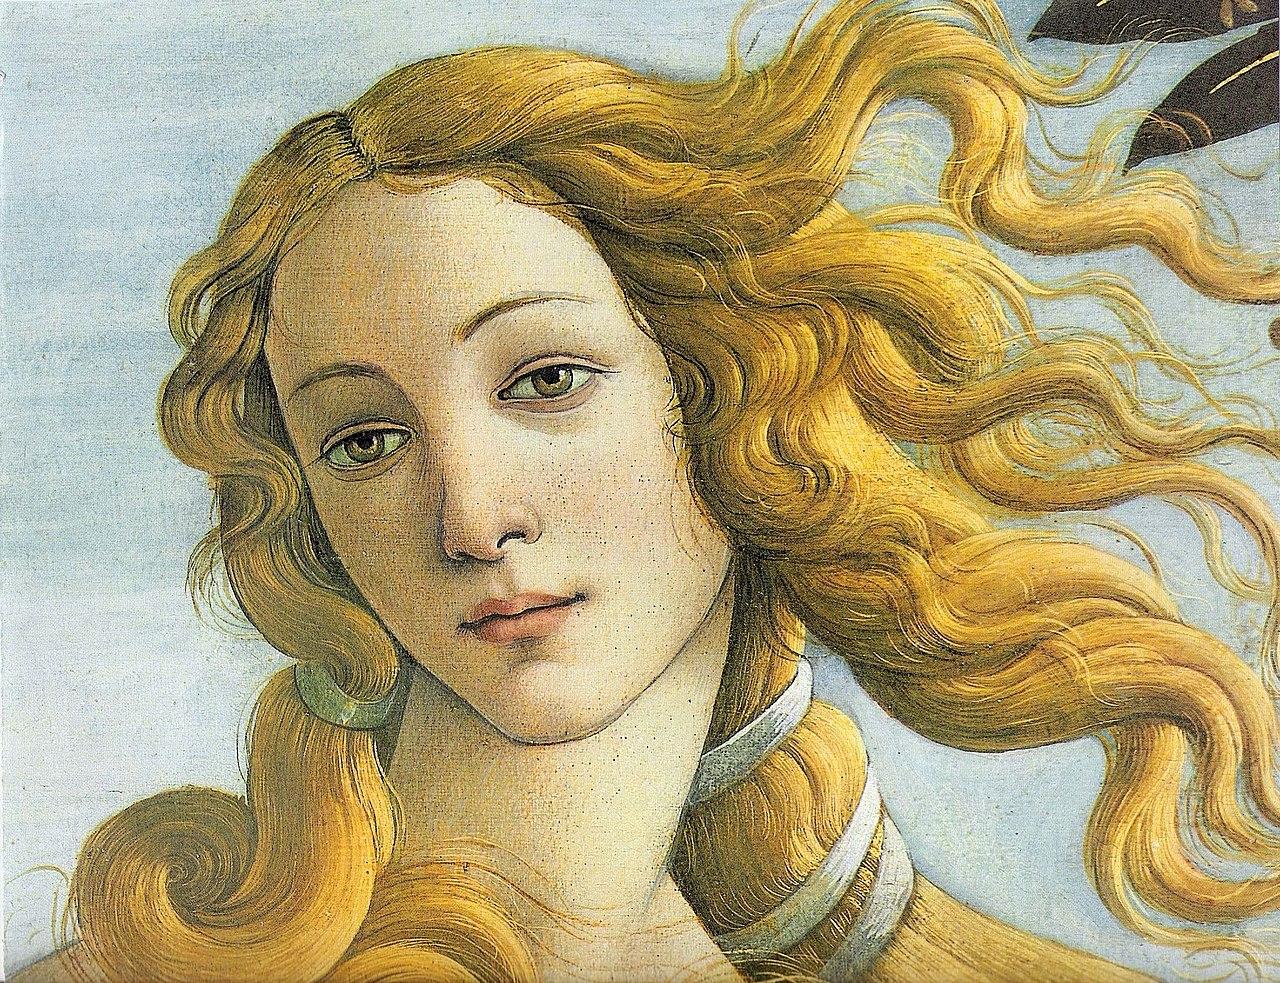 1280px-Venus_botticelli_detail.jpg